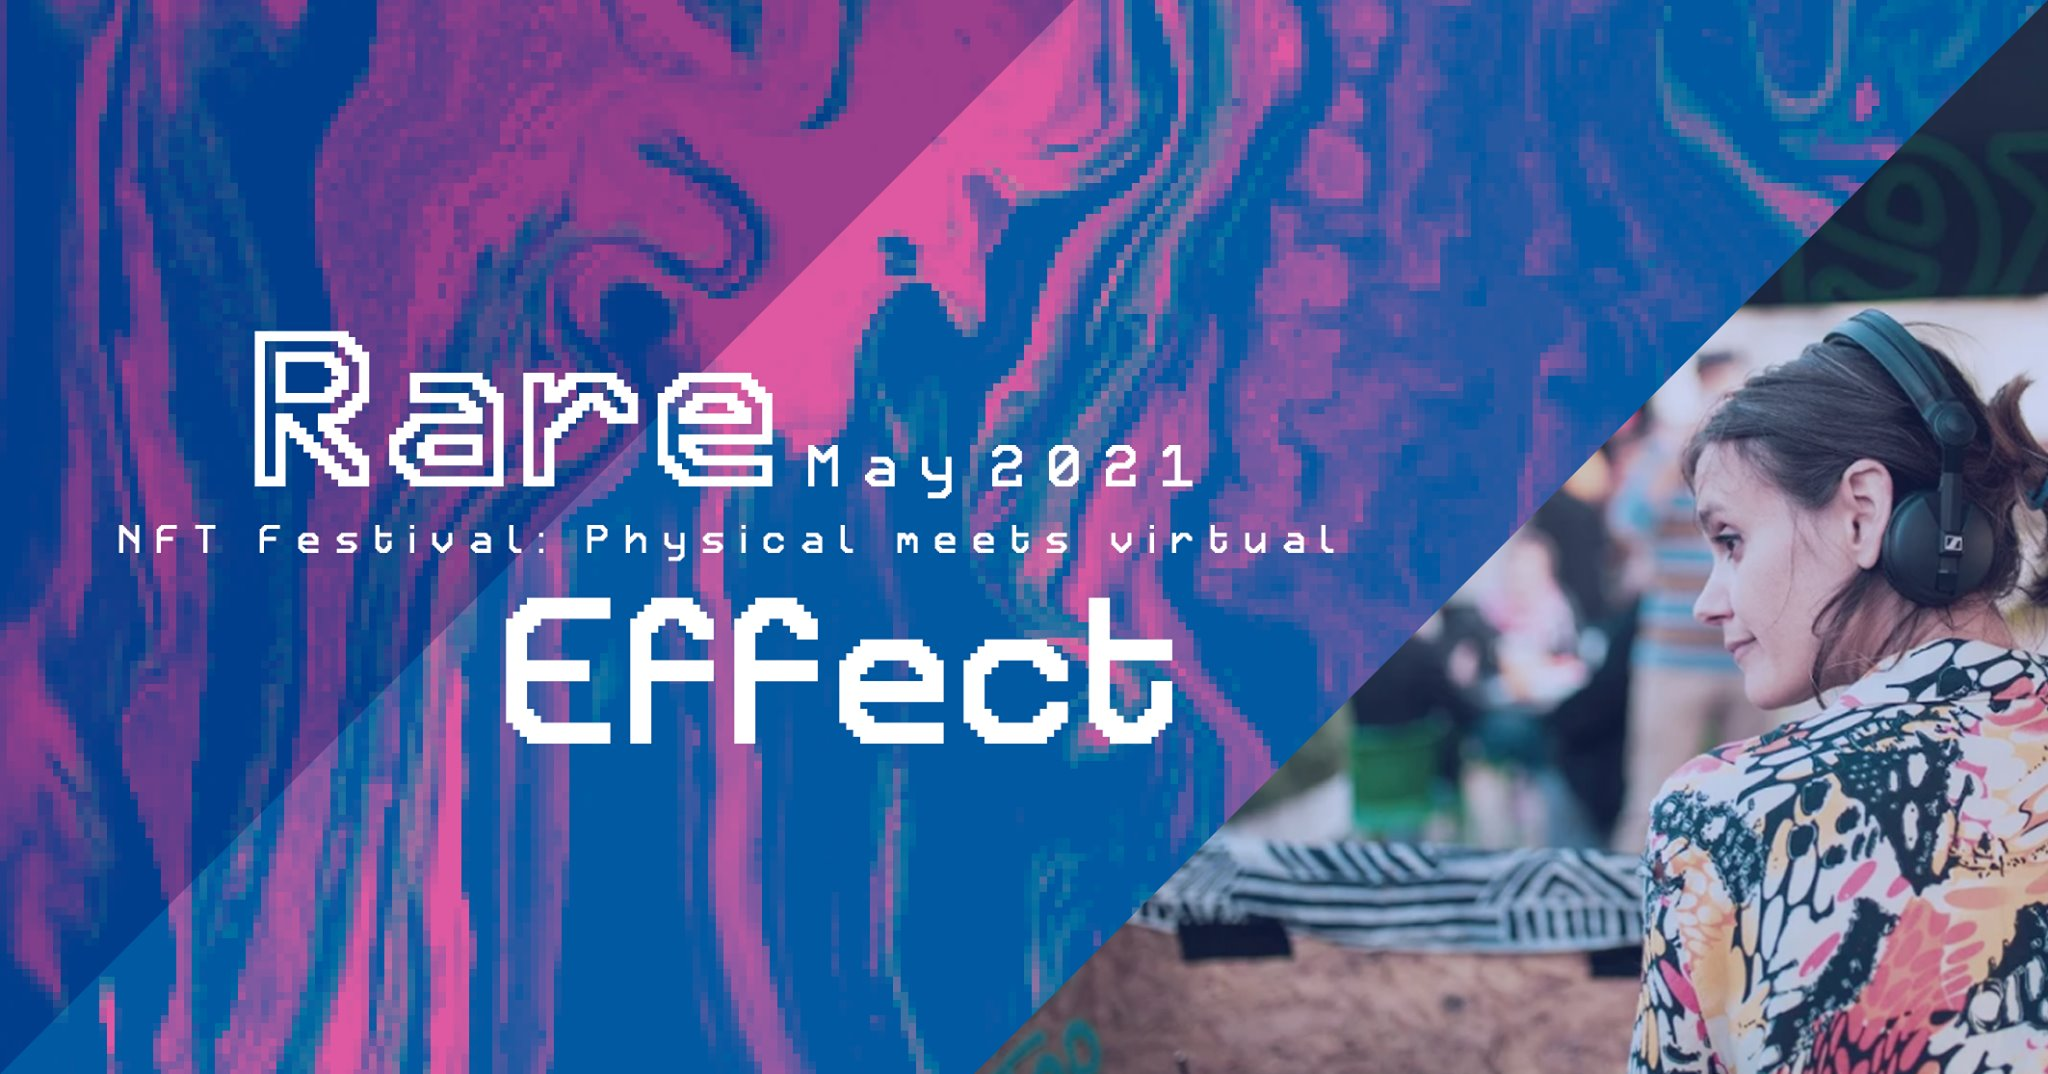 Rare Effect Vol2 Opening with Penelope, Trol2000 & Nick Craddock